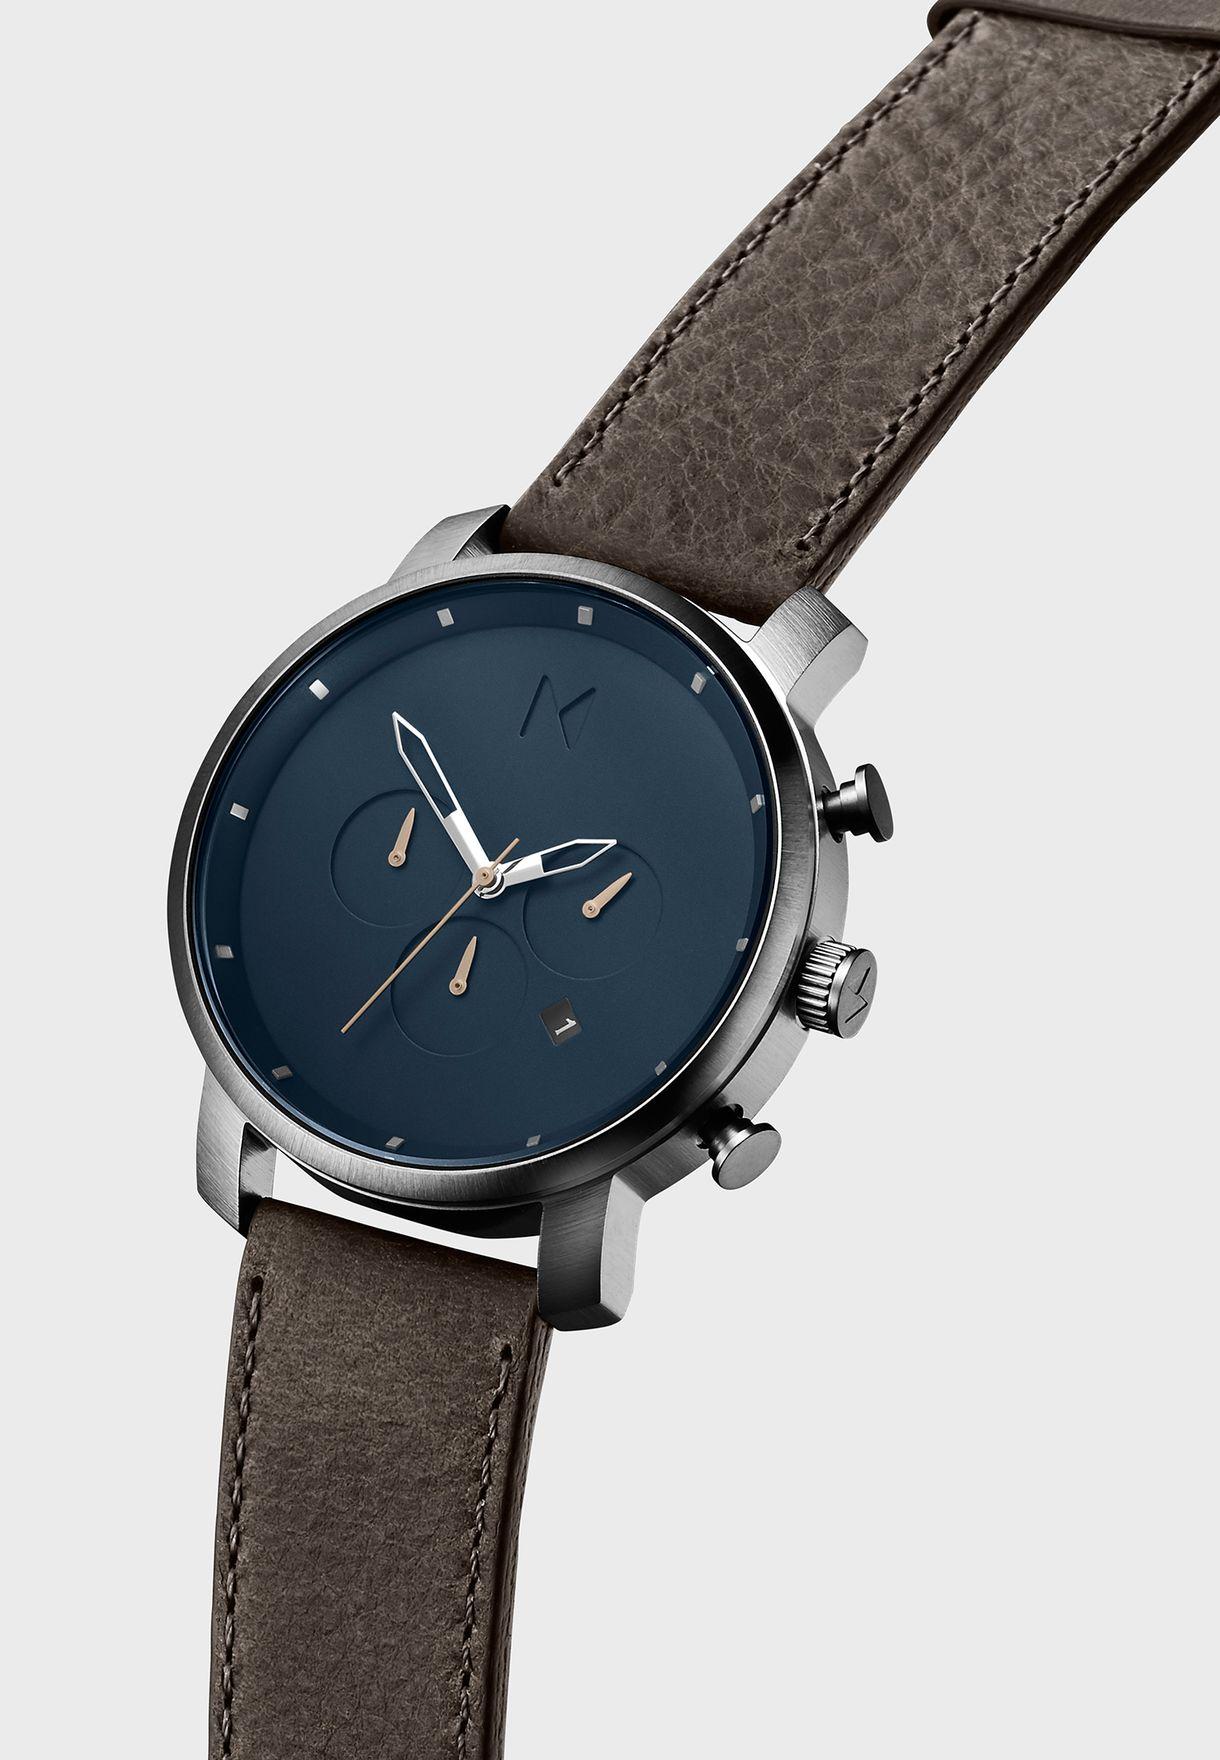 MC01-SGR Chronograph Analog Watch